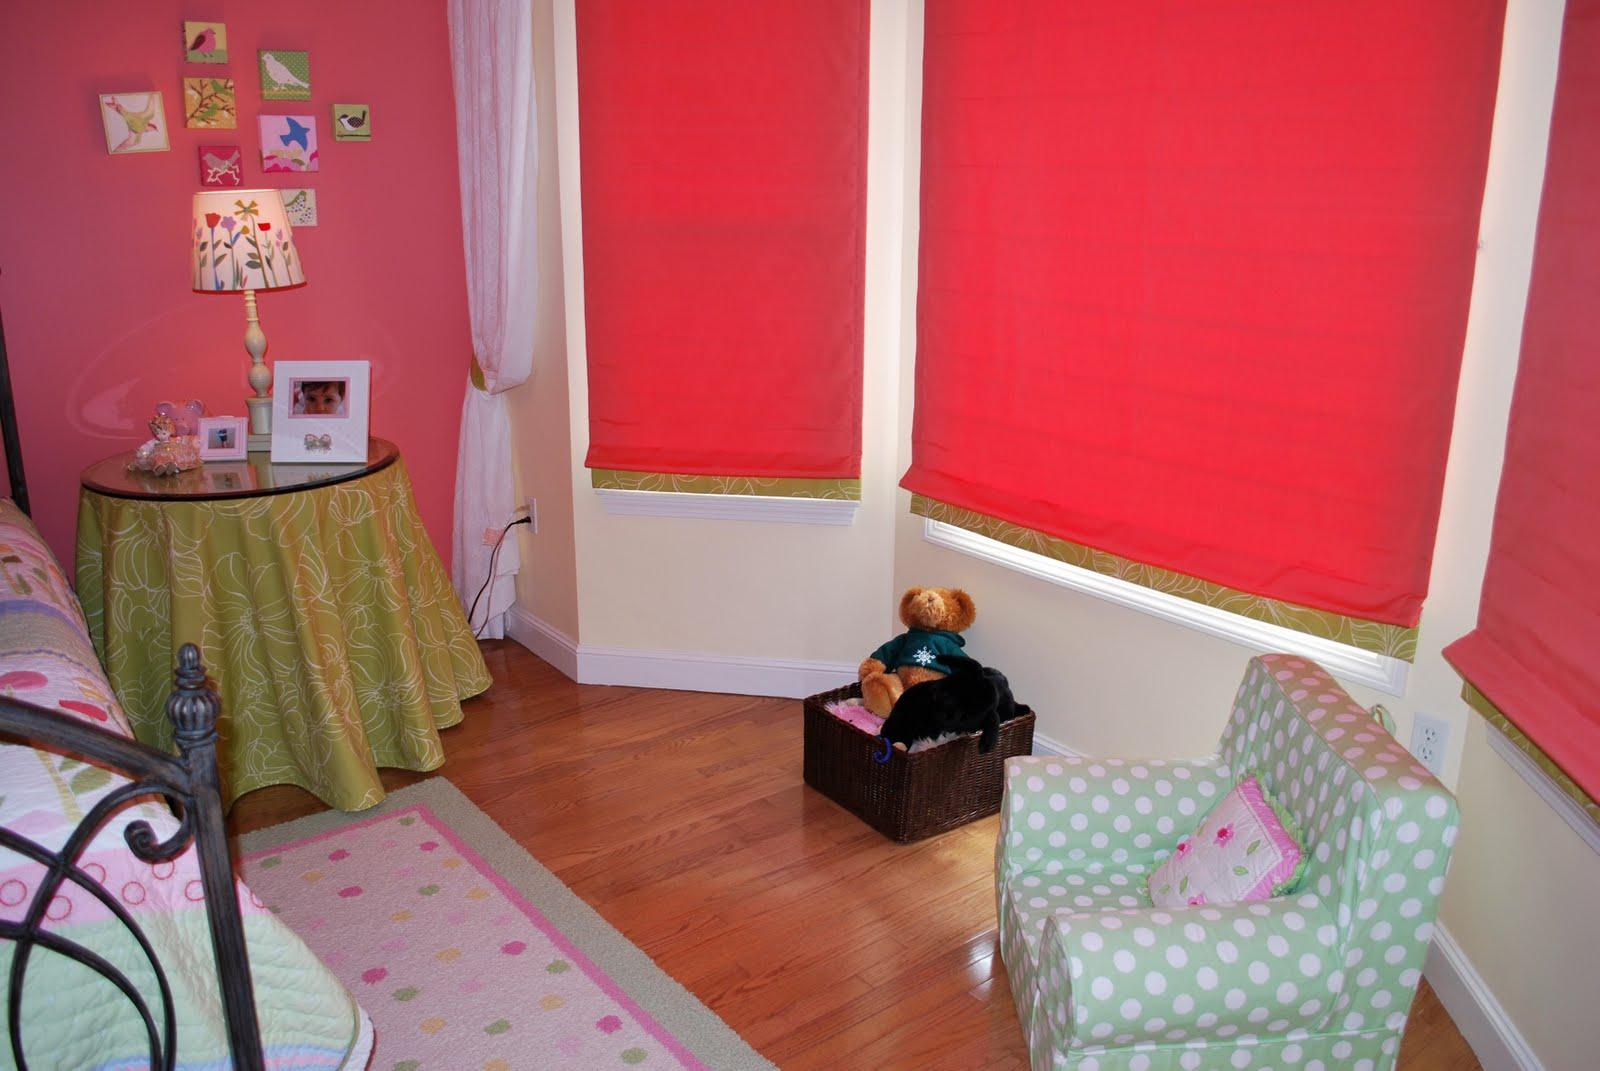 kids bedroom curtains  wallpress 1080p hd desktop